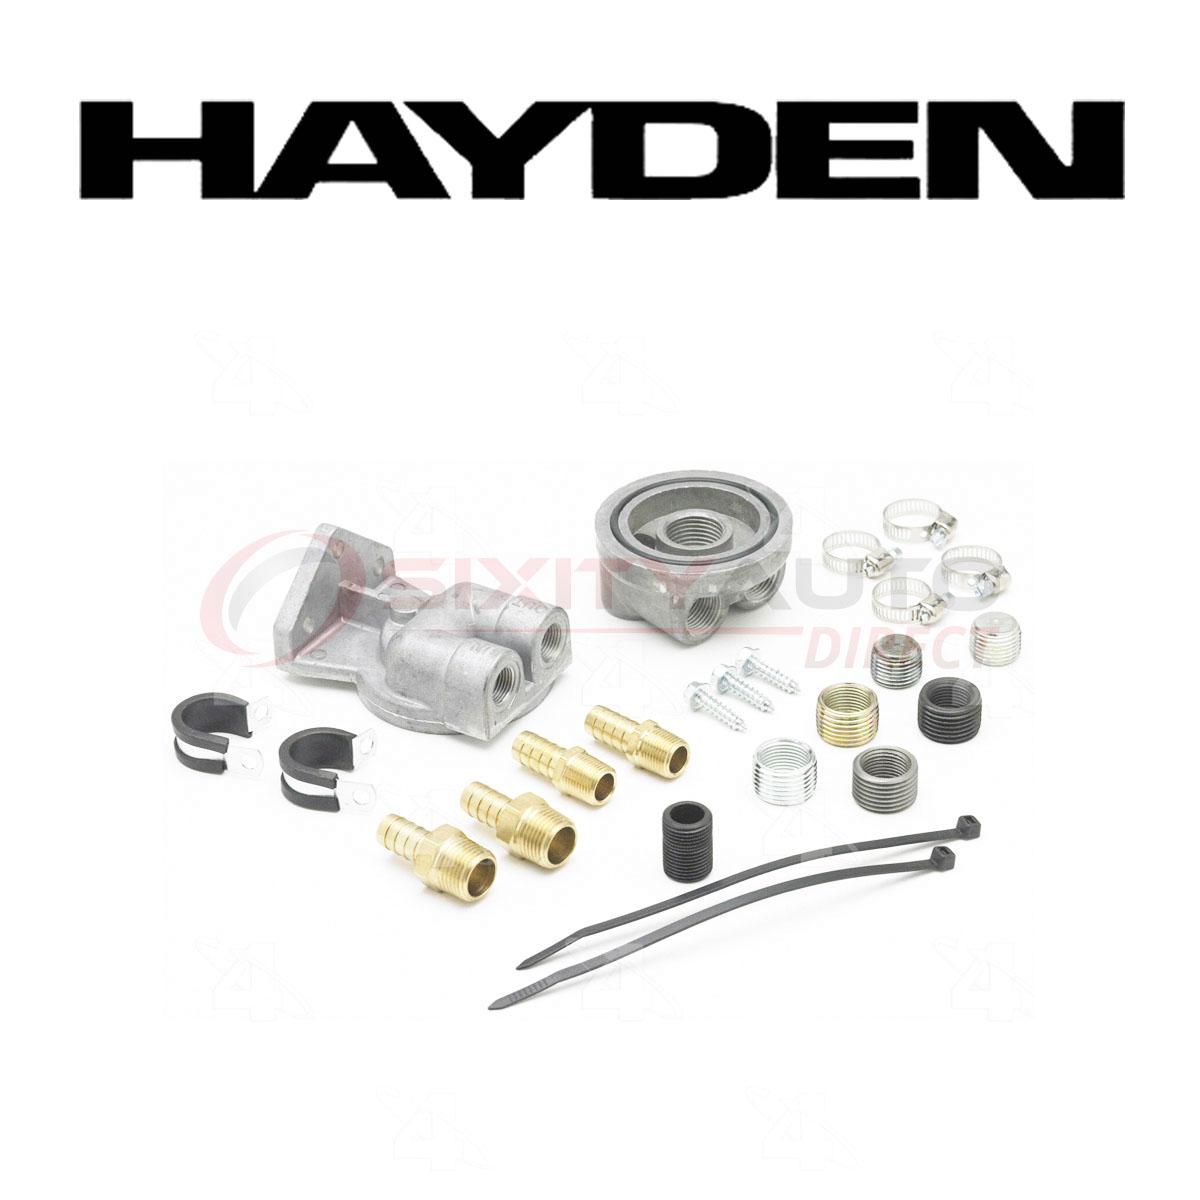 Hayden Oil Filter Remote Mounting Kit for 2009 Subaru